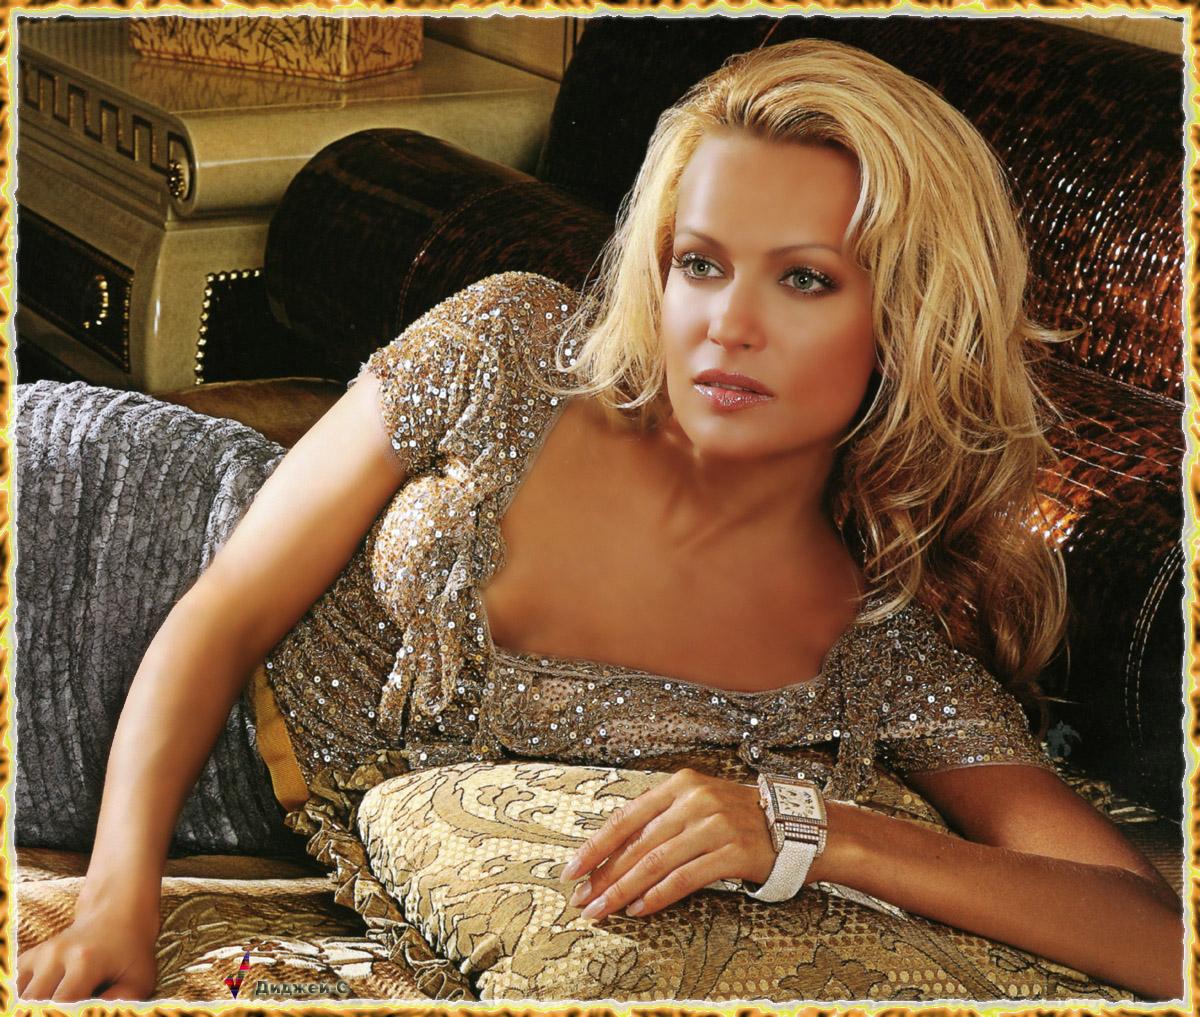 foto-russkih-aktris-snimavshihsya-v-reklame